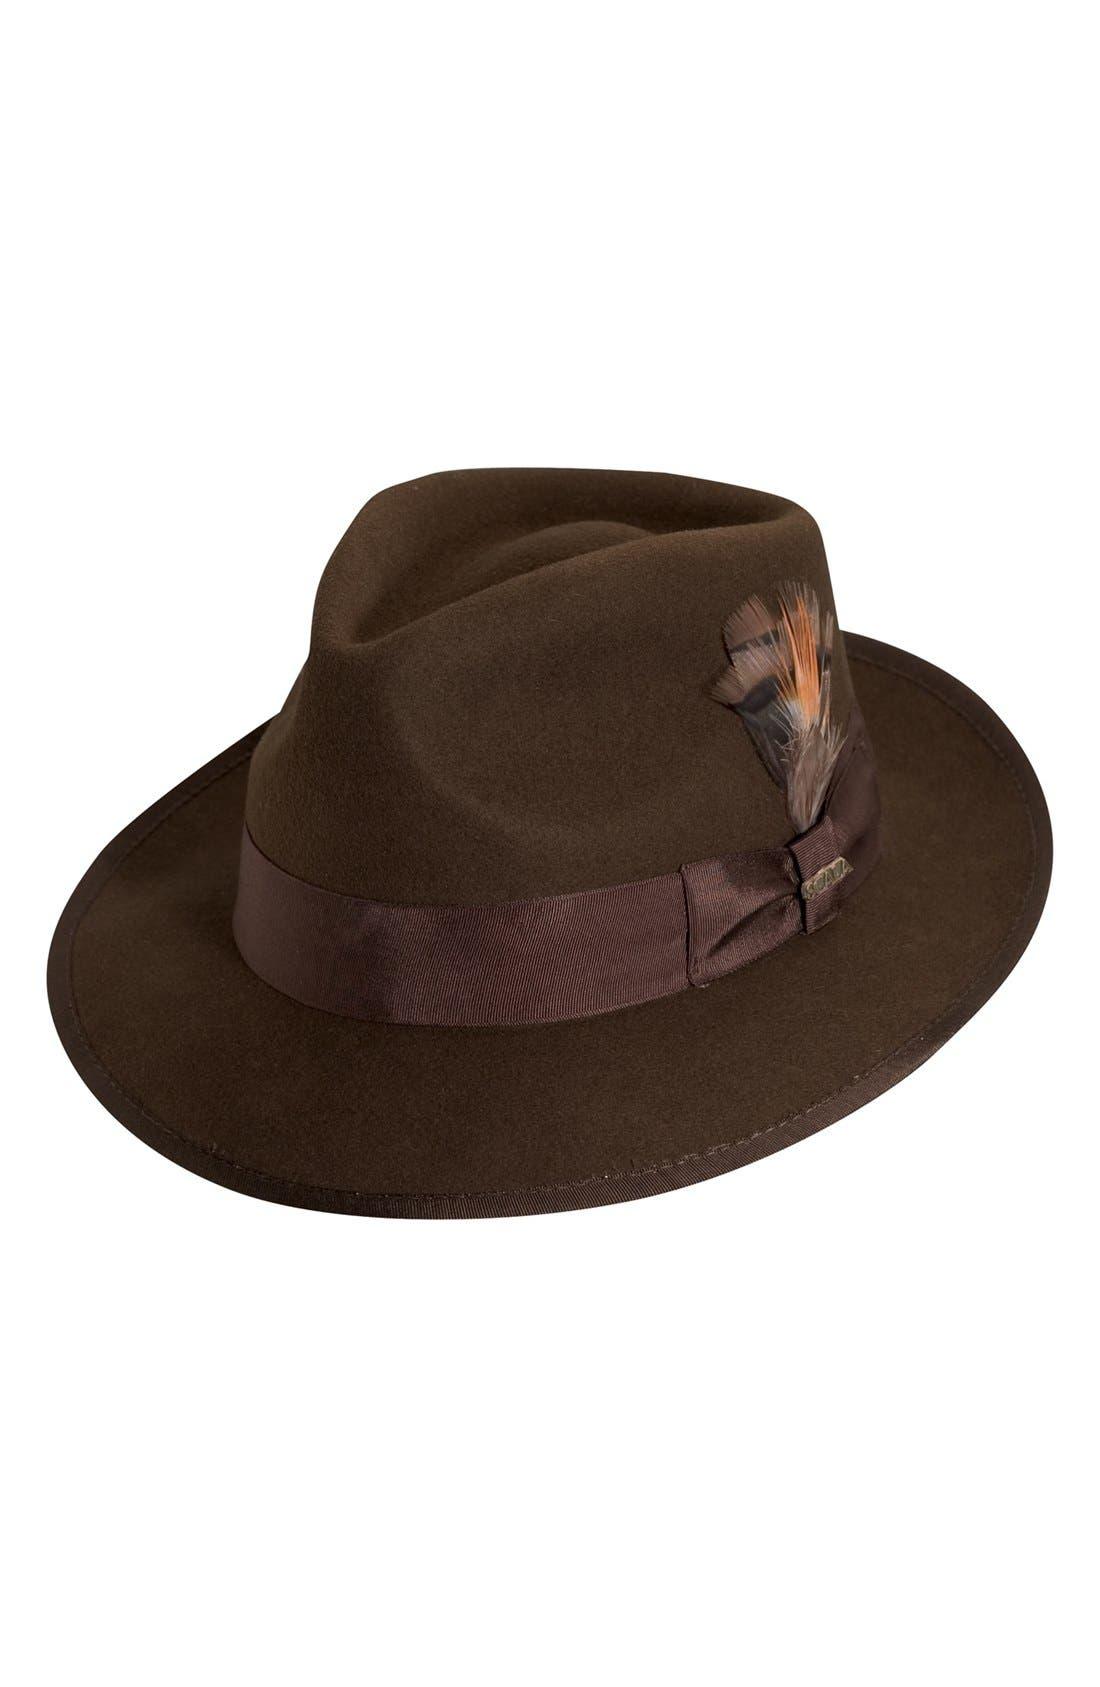 'Classico' Wool Felt Snap Brim Hat,                         Main,                         color, Brown